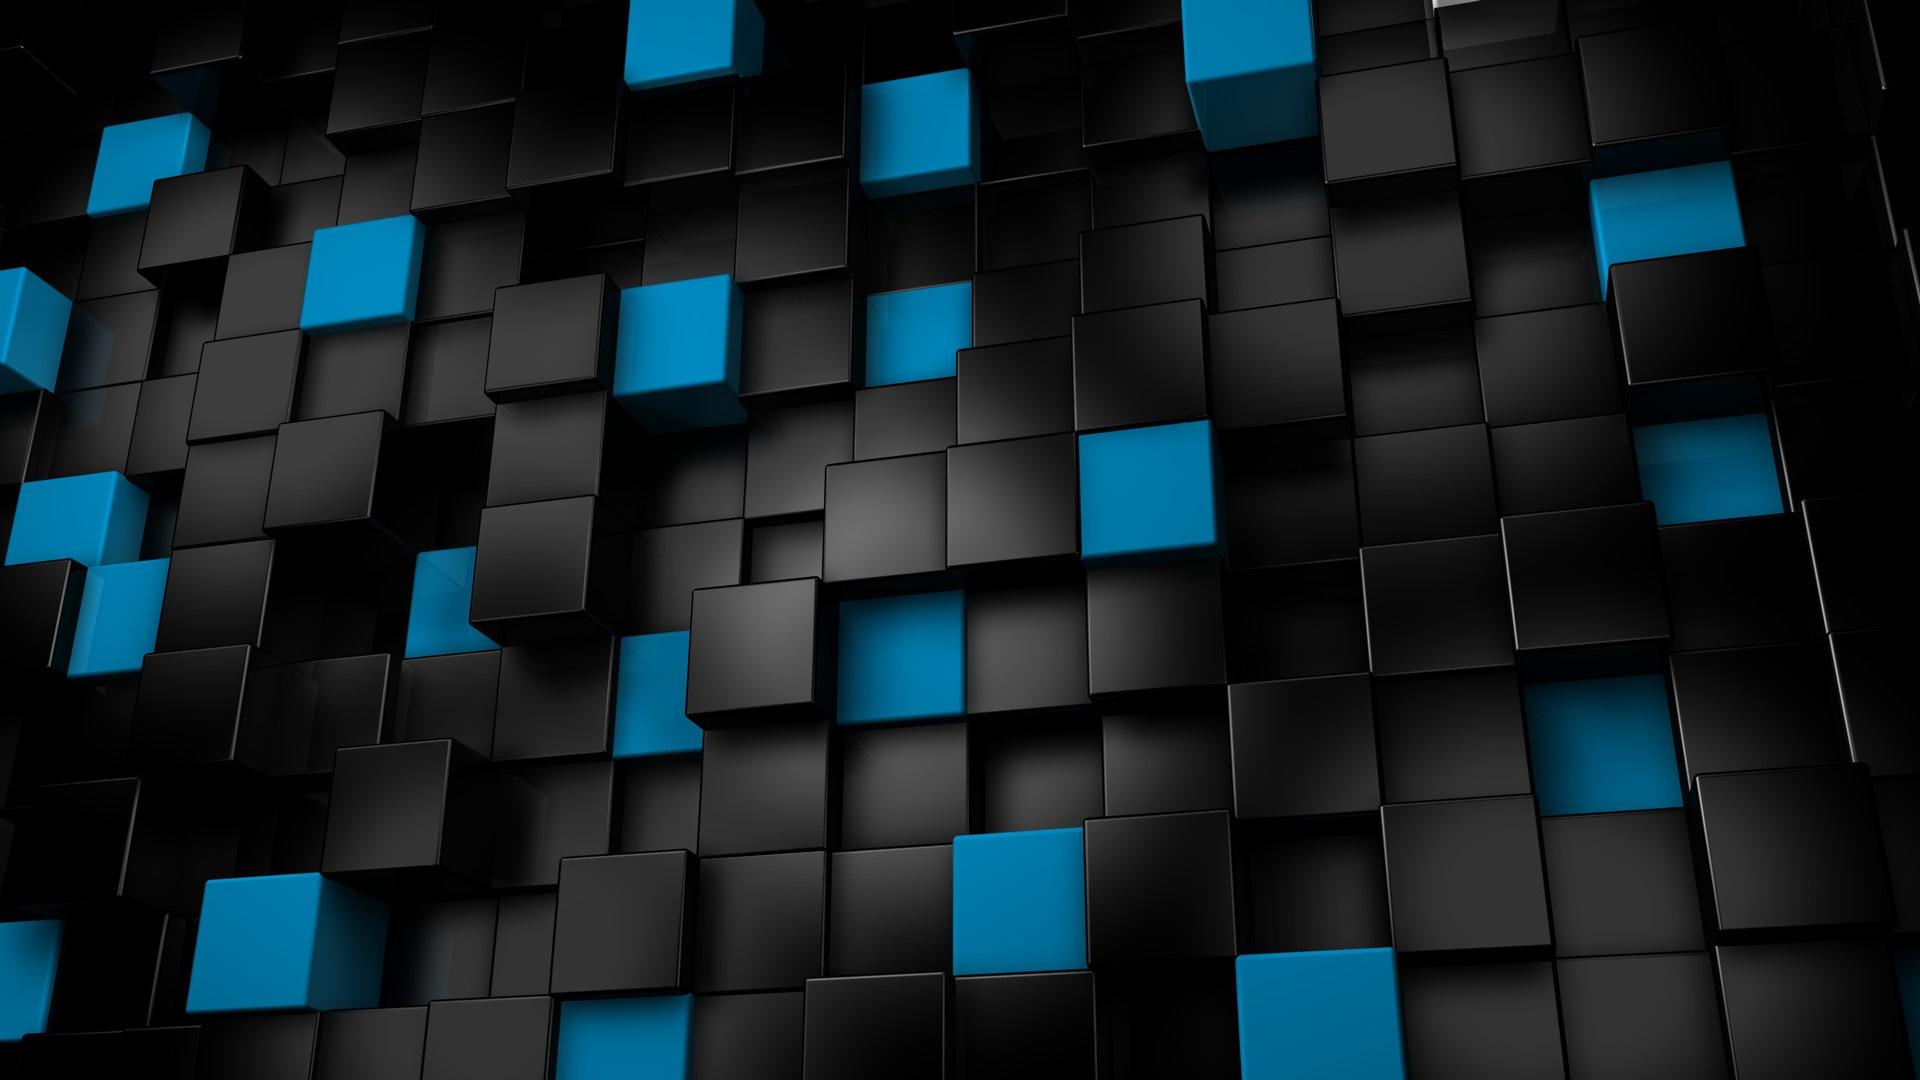 3d black cubes backgrounds wallpapers1 wallpapers55com   Best 1920x1080